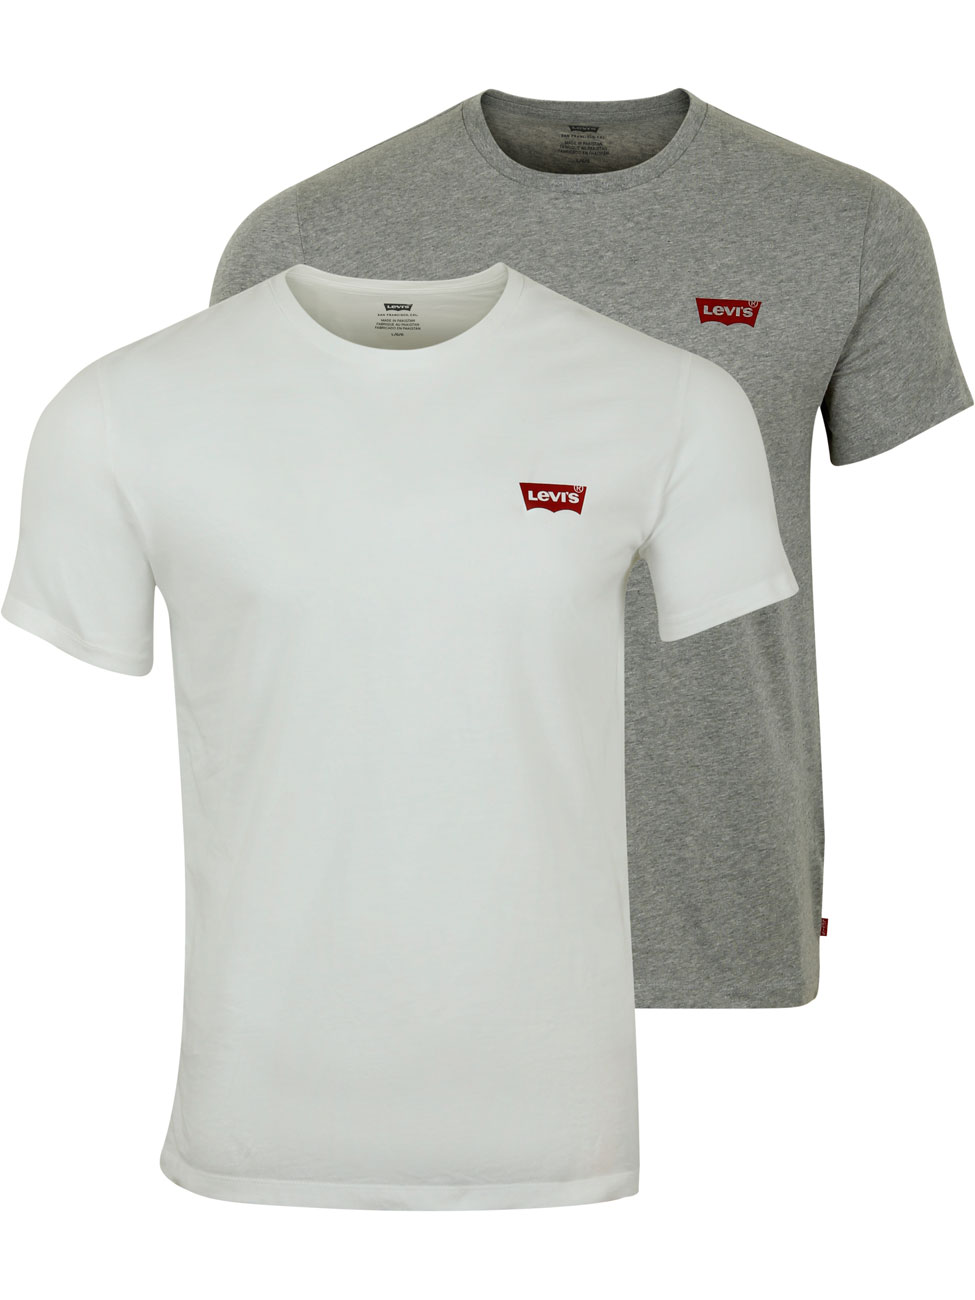 Levis Herren Rundhals T Shirt Crewneck Graphic Tee   20er Pack